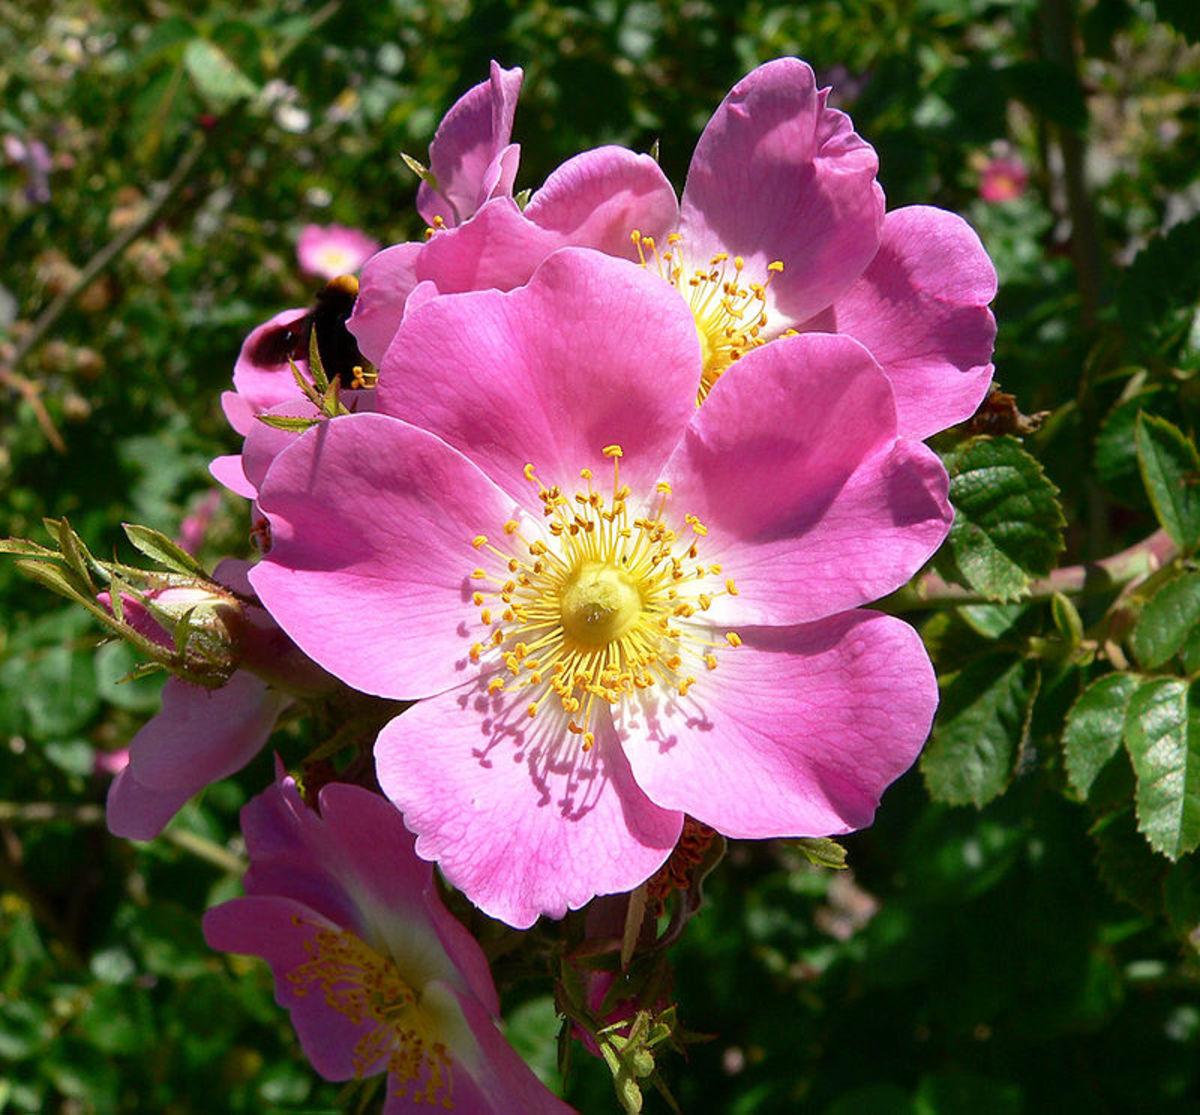 How to Grow an Eglantine (Sweet Briar) Rose, an Heirloom Rose